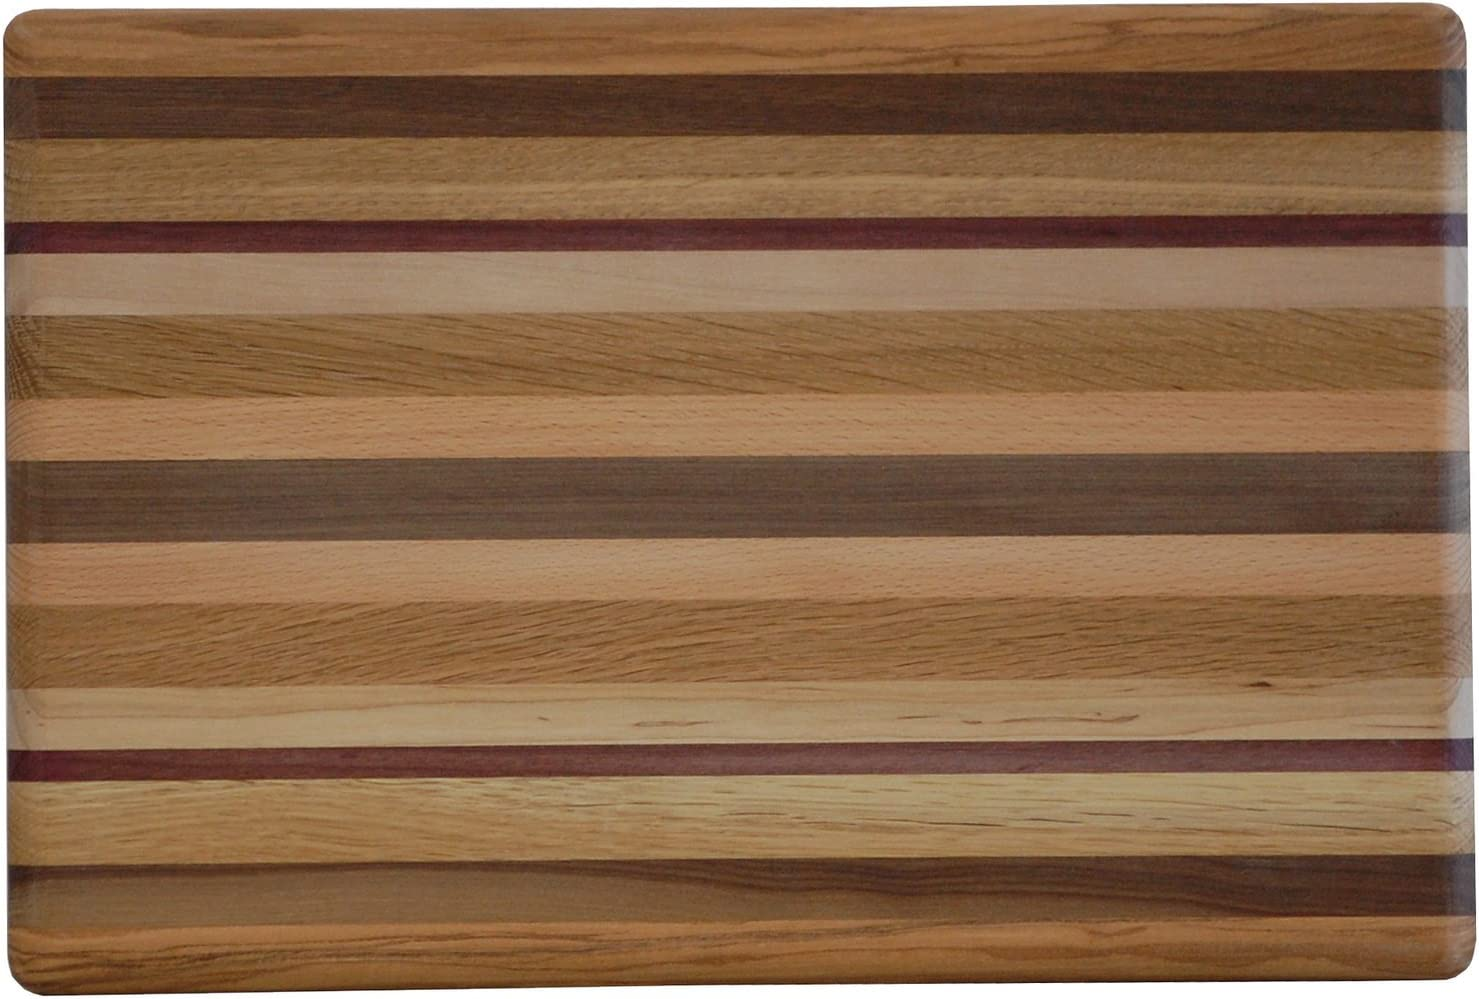 Kitchen Exotic Hard Woods Rectangle Cutting Board Amish Made USA 2 Sizes